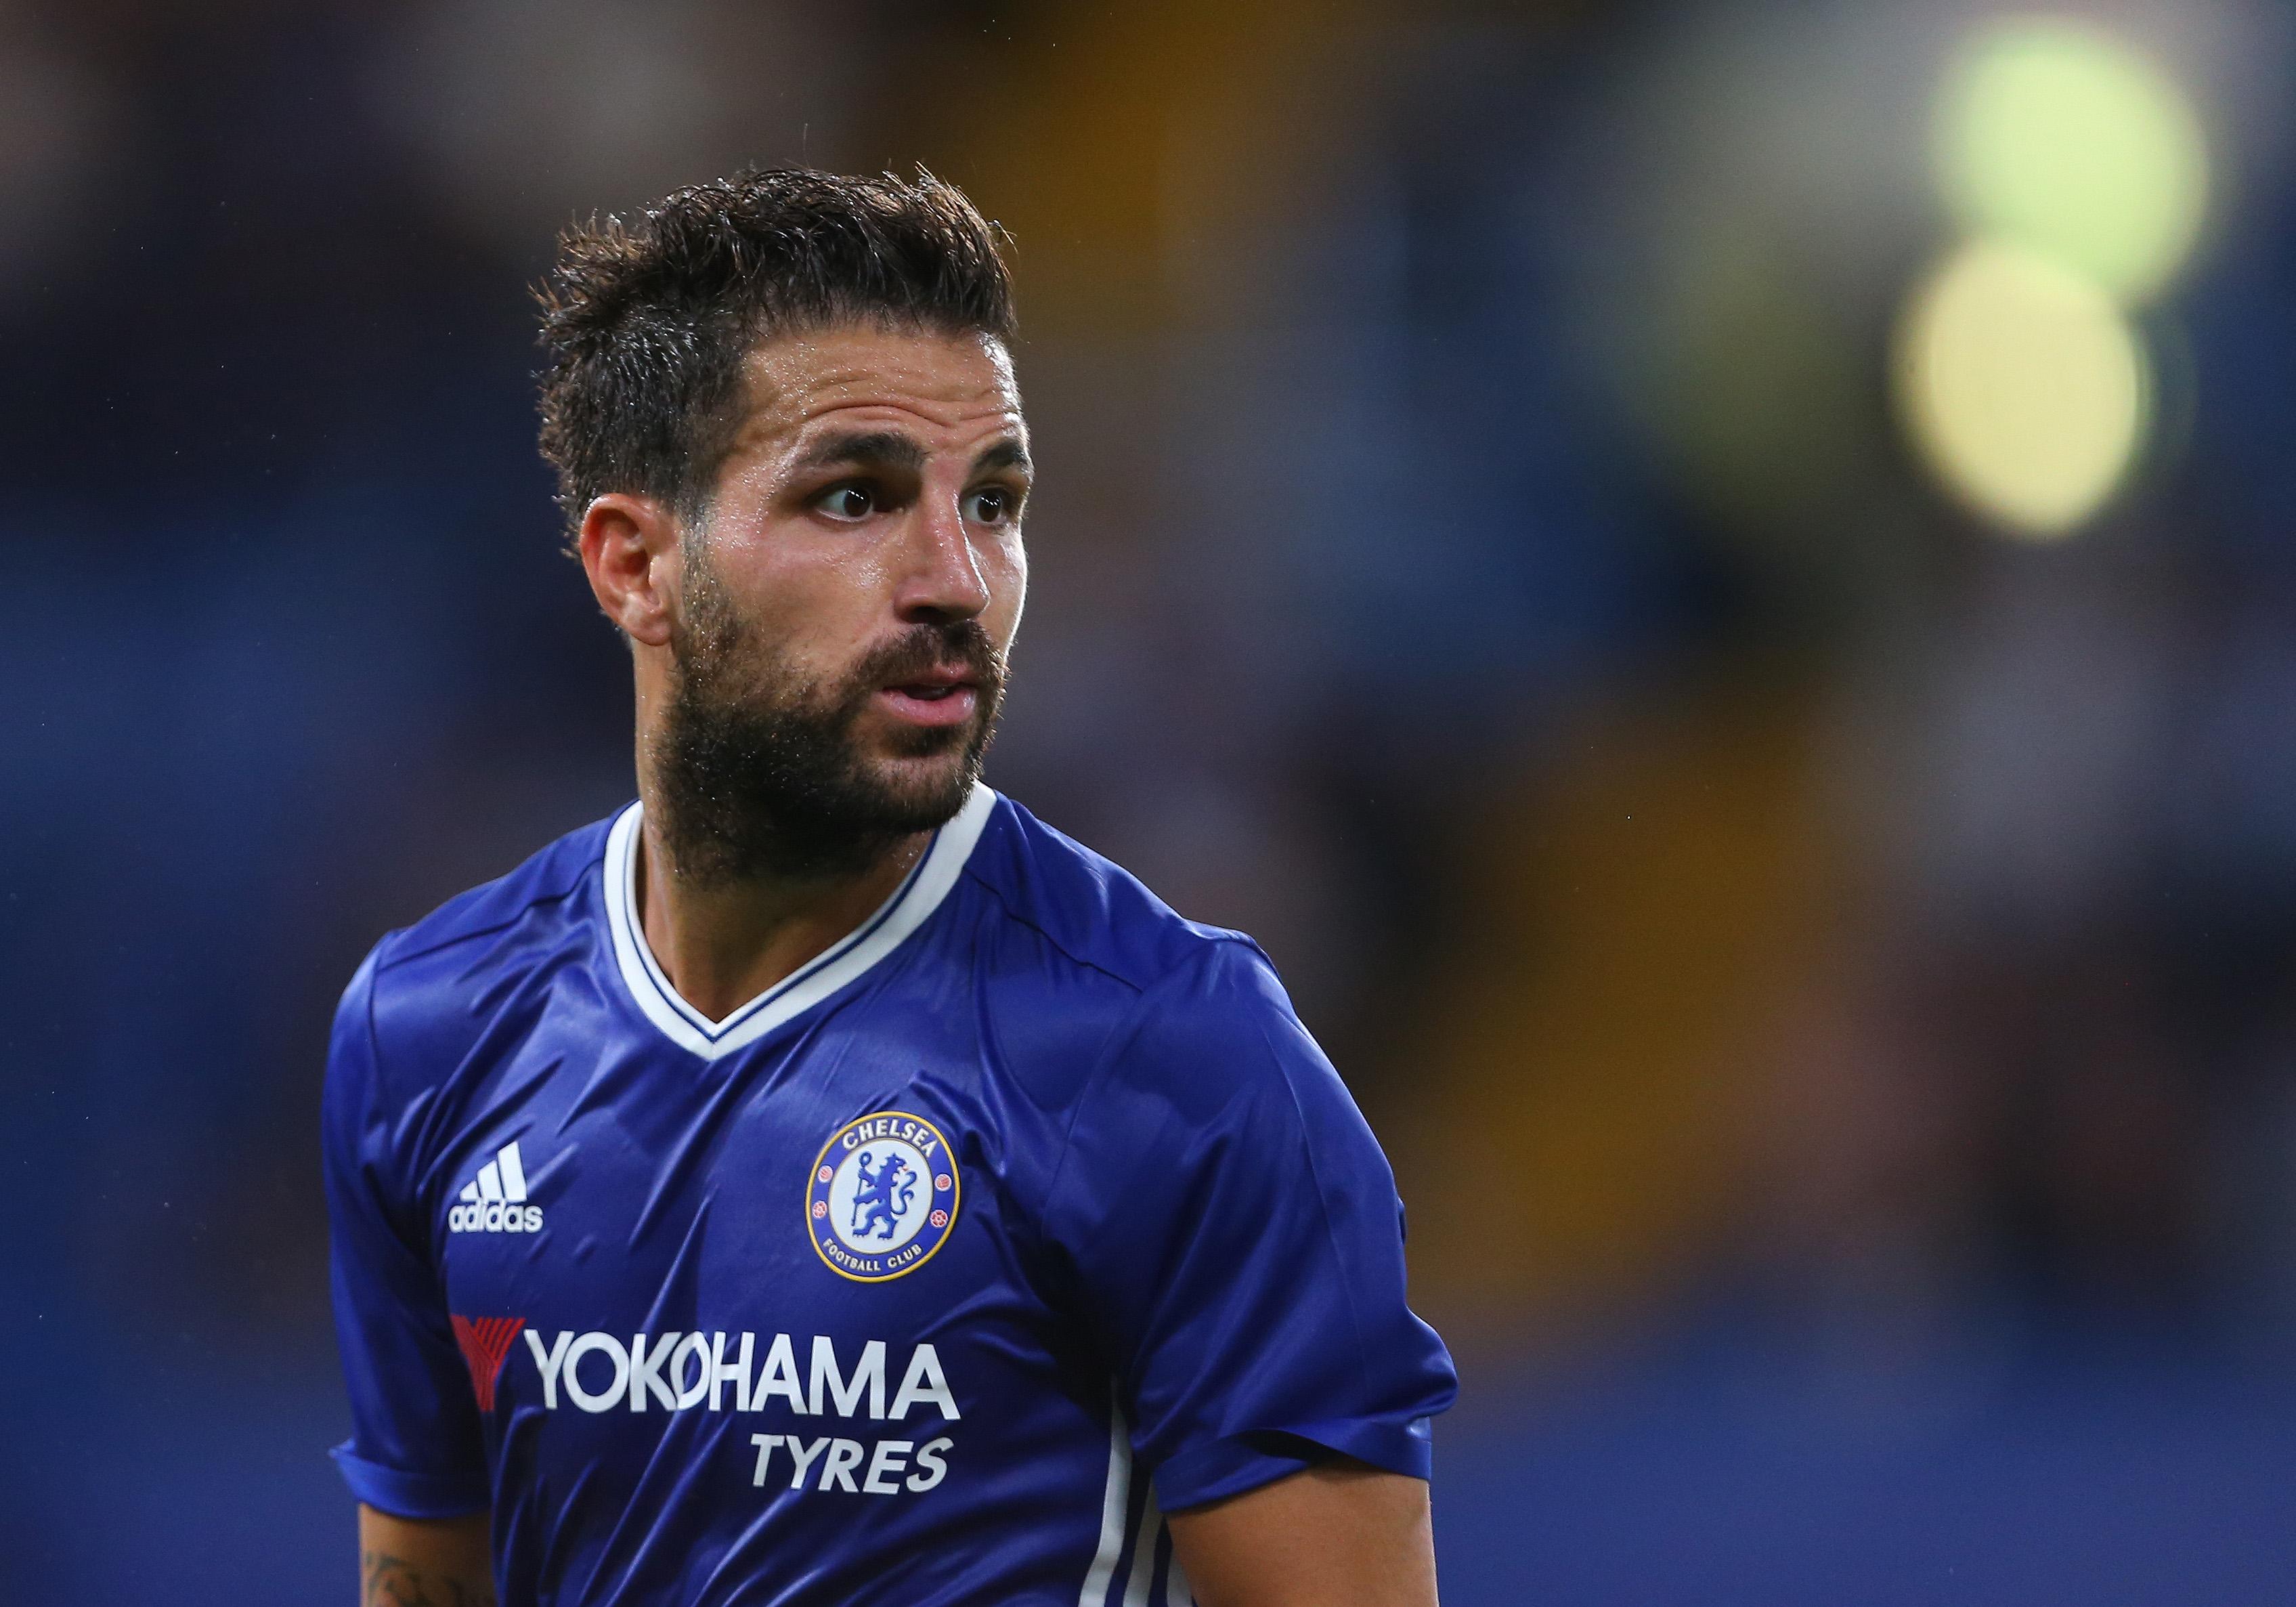 Chelsea to launch £10m bargain bid for Fiorentina midfielder Milan Badelj